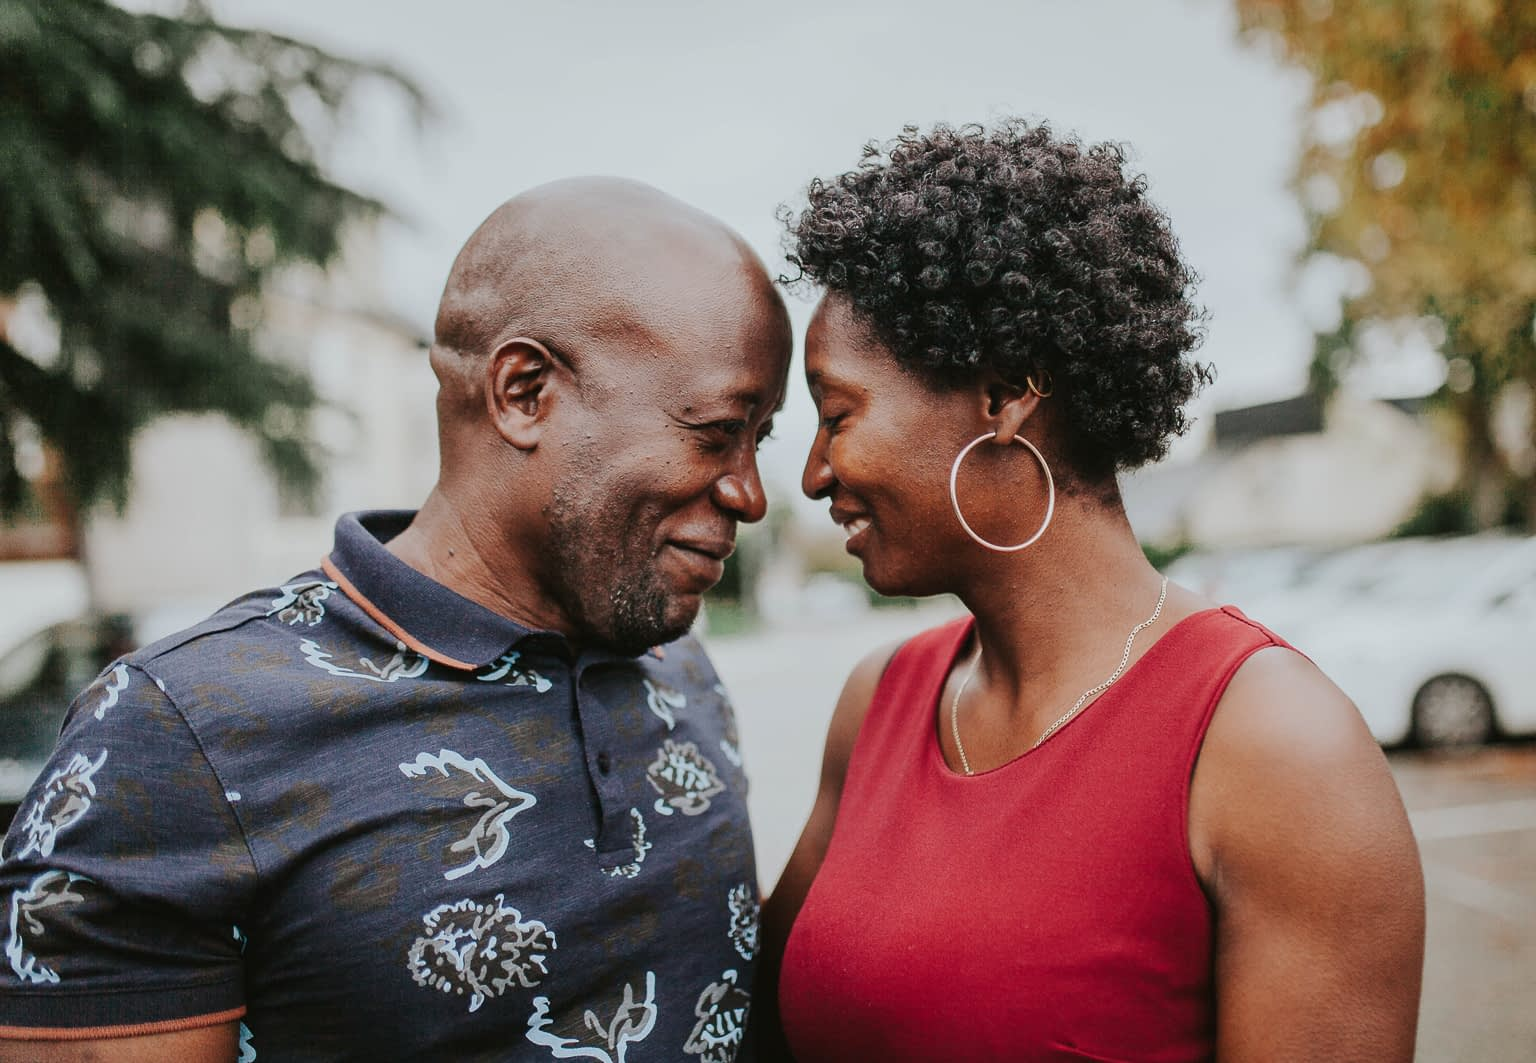 seance photo couple engagement rennes 75